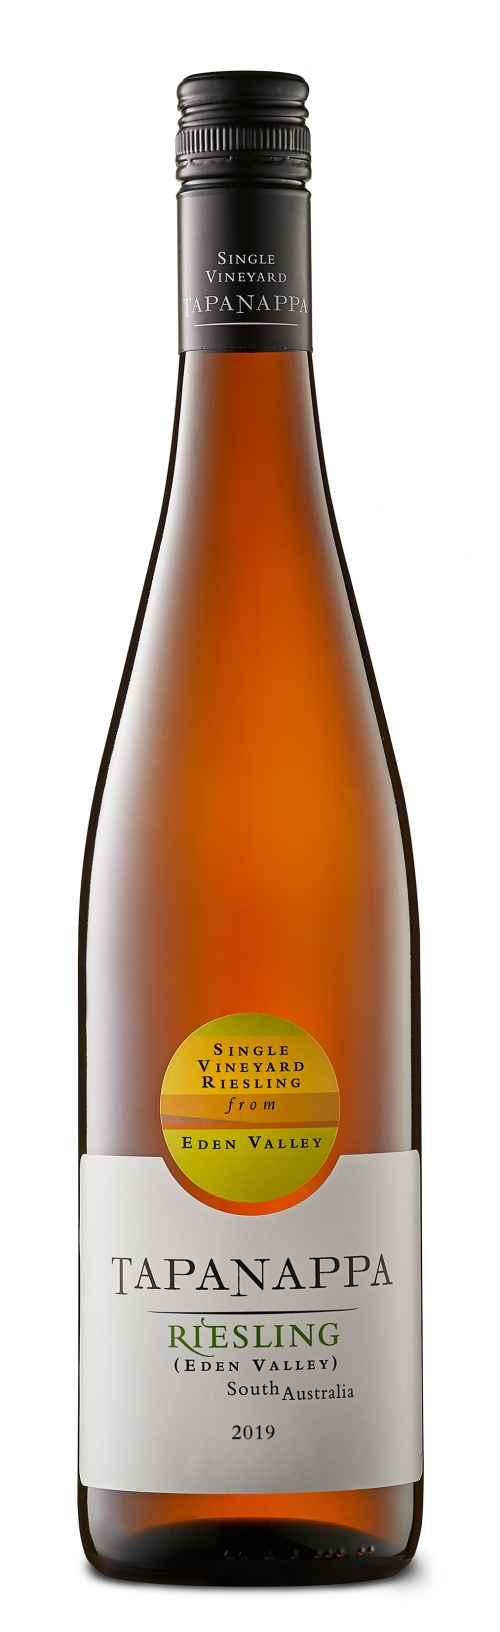 Tapanappa Eden Valley 2019 Riesling bottleshot